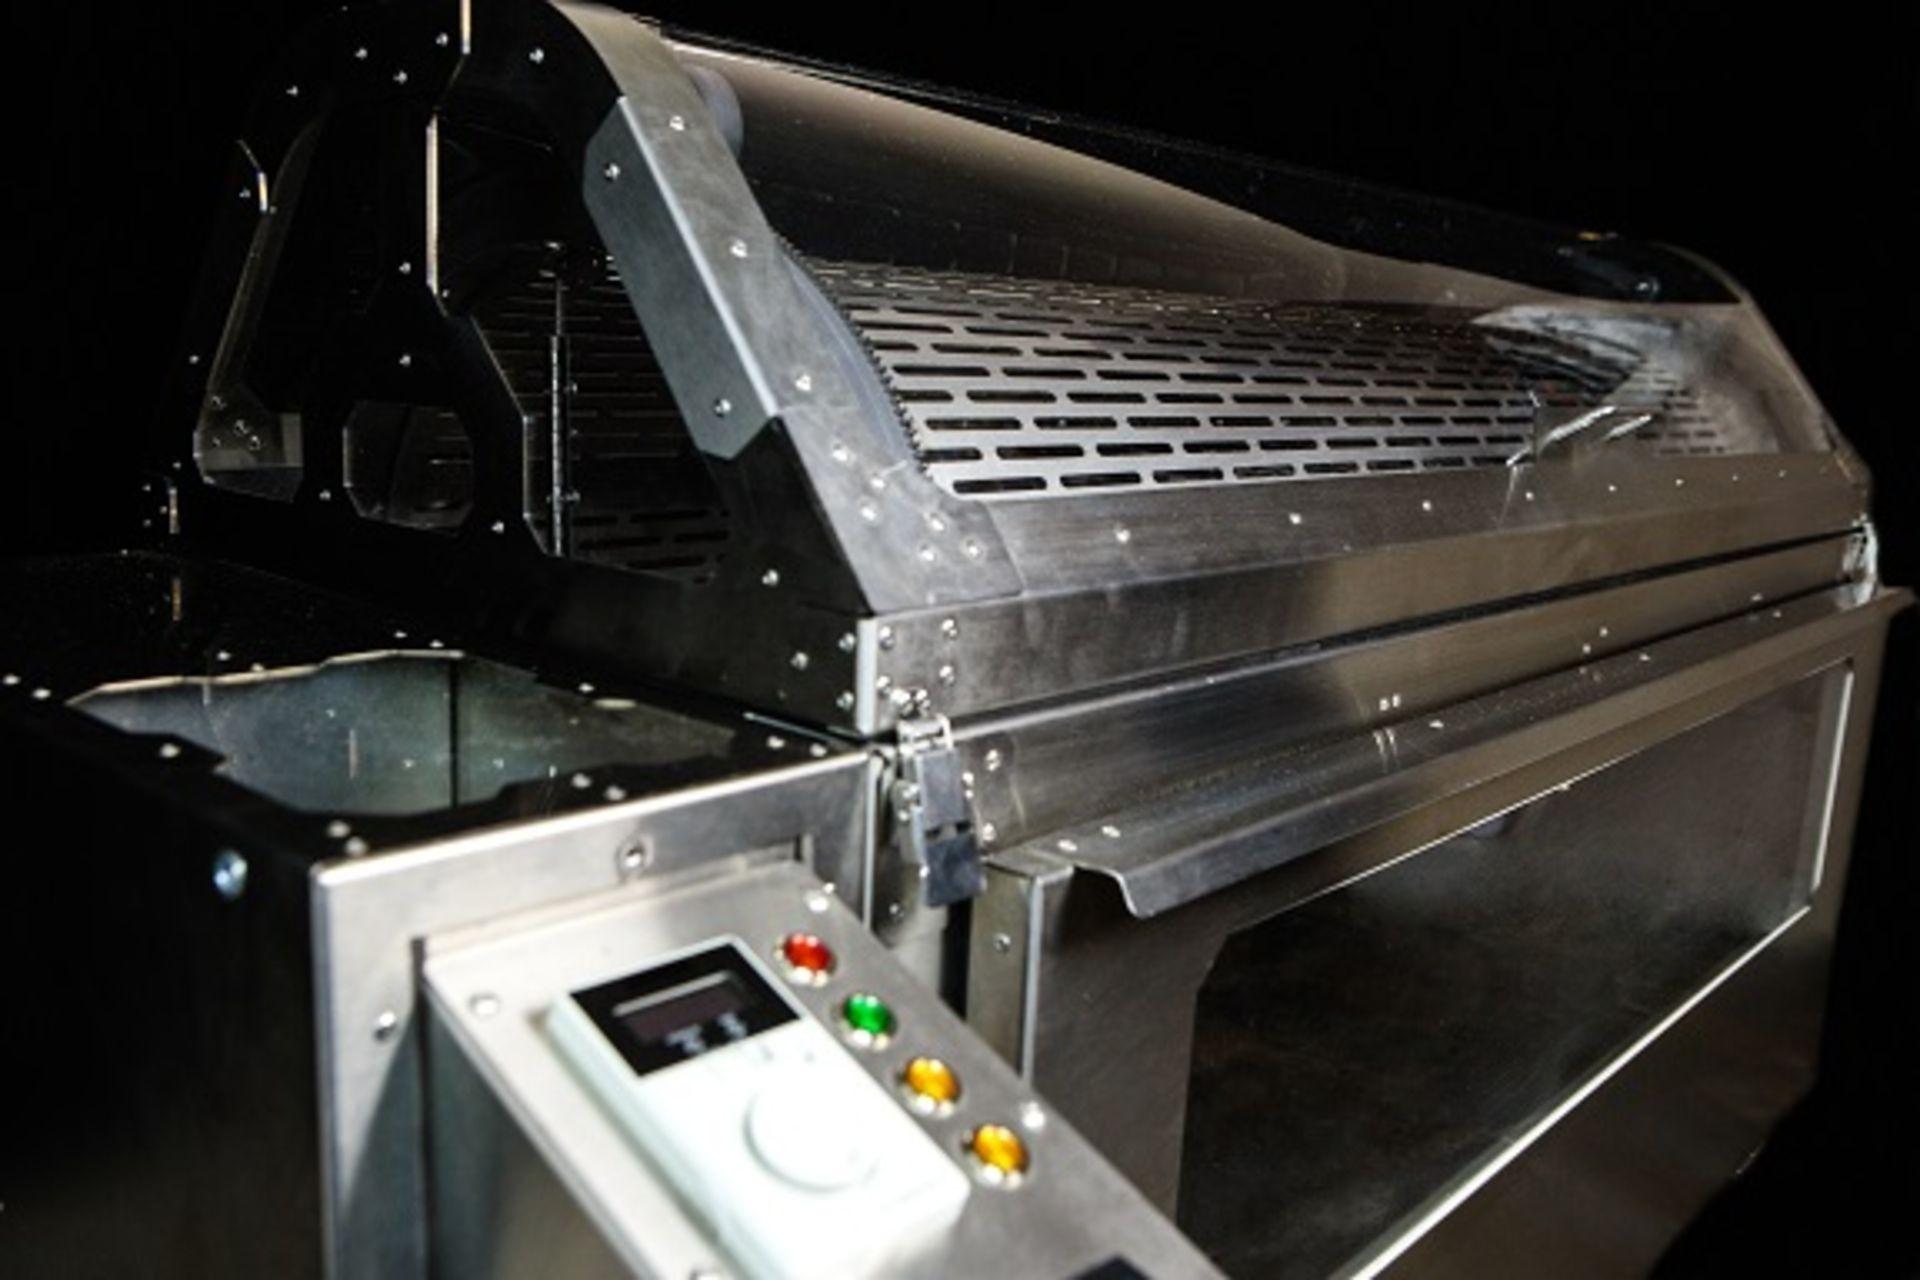 Unused/FactoryNew Revolution Cannabis & Hemp Flower Finisher System Model RDF 4300.100-200 lbs/8 hrs - Image 22 of 32